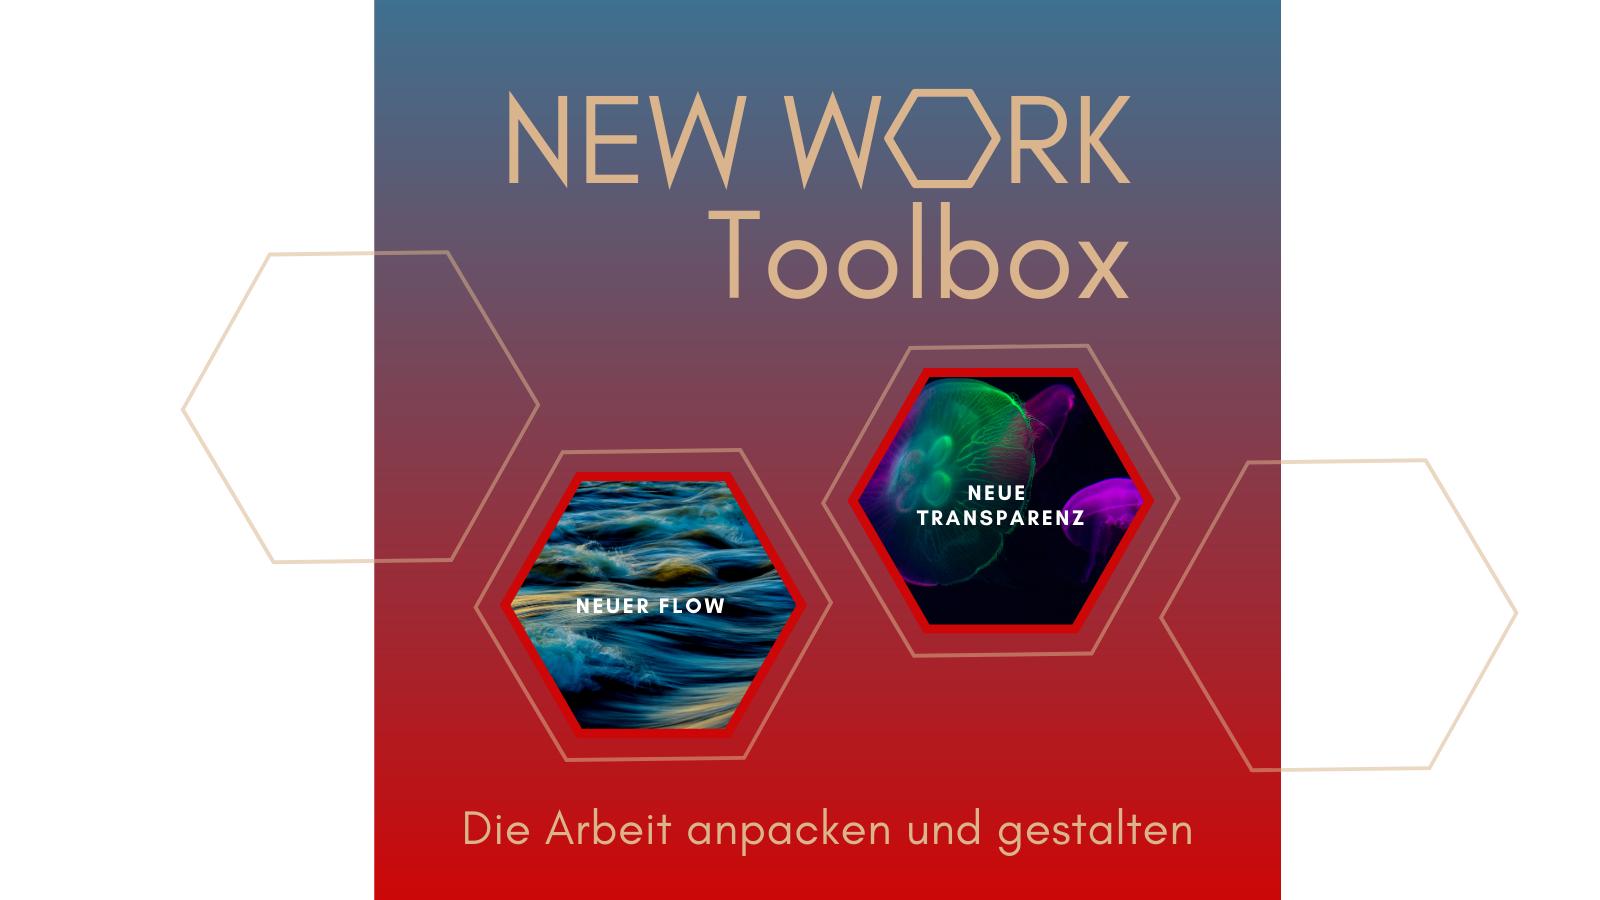 New Work Toolbox